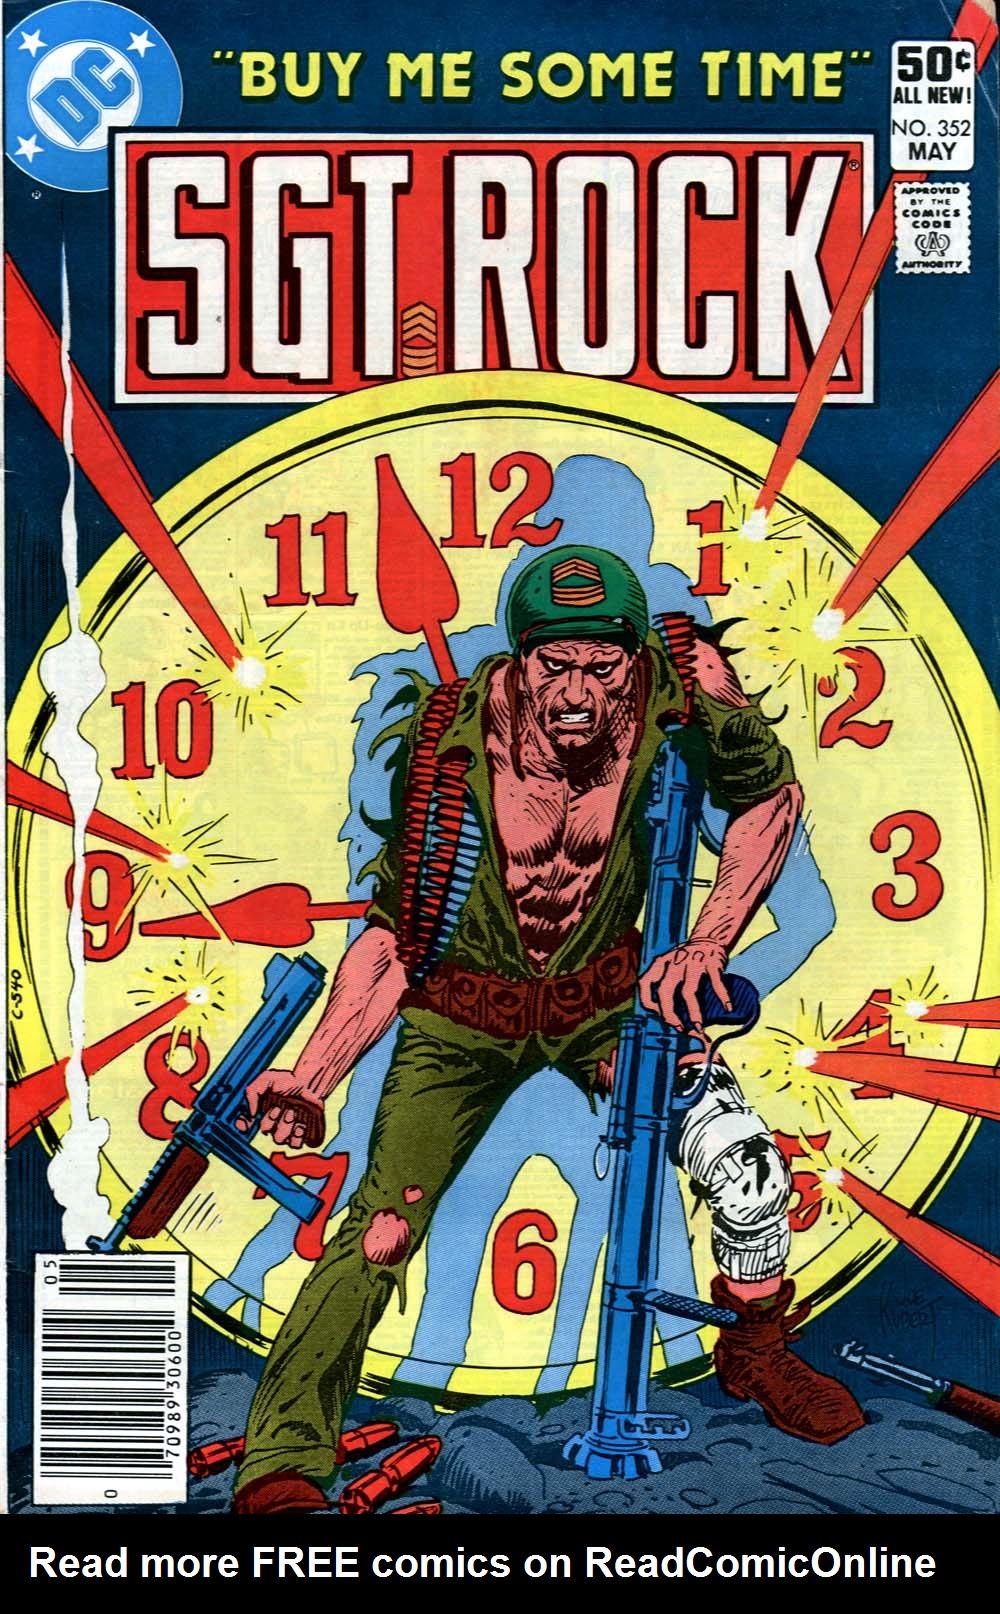 Read online Sgt. Rock comic -  Issue #352 - 1